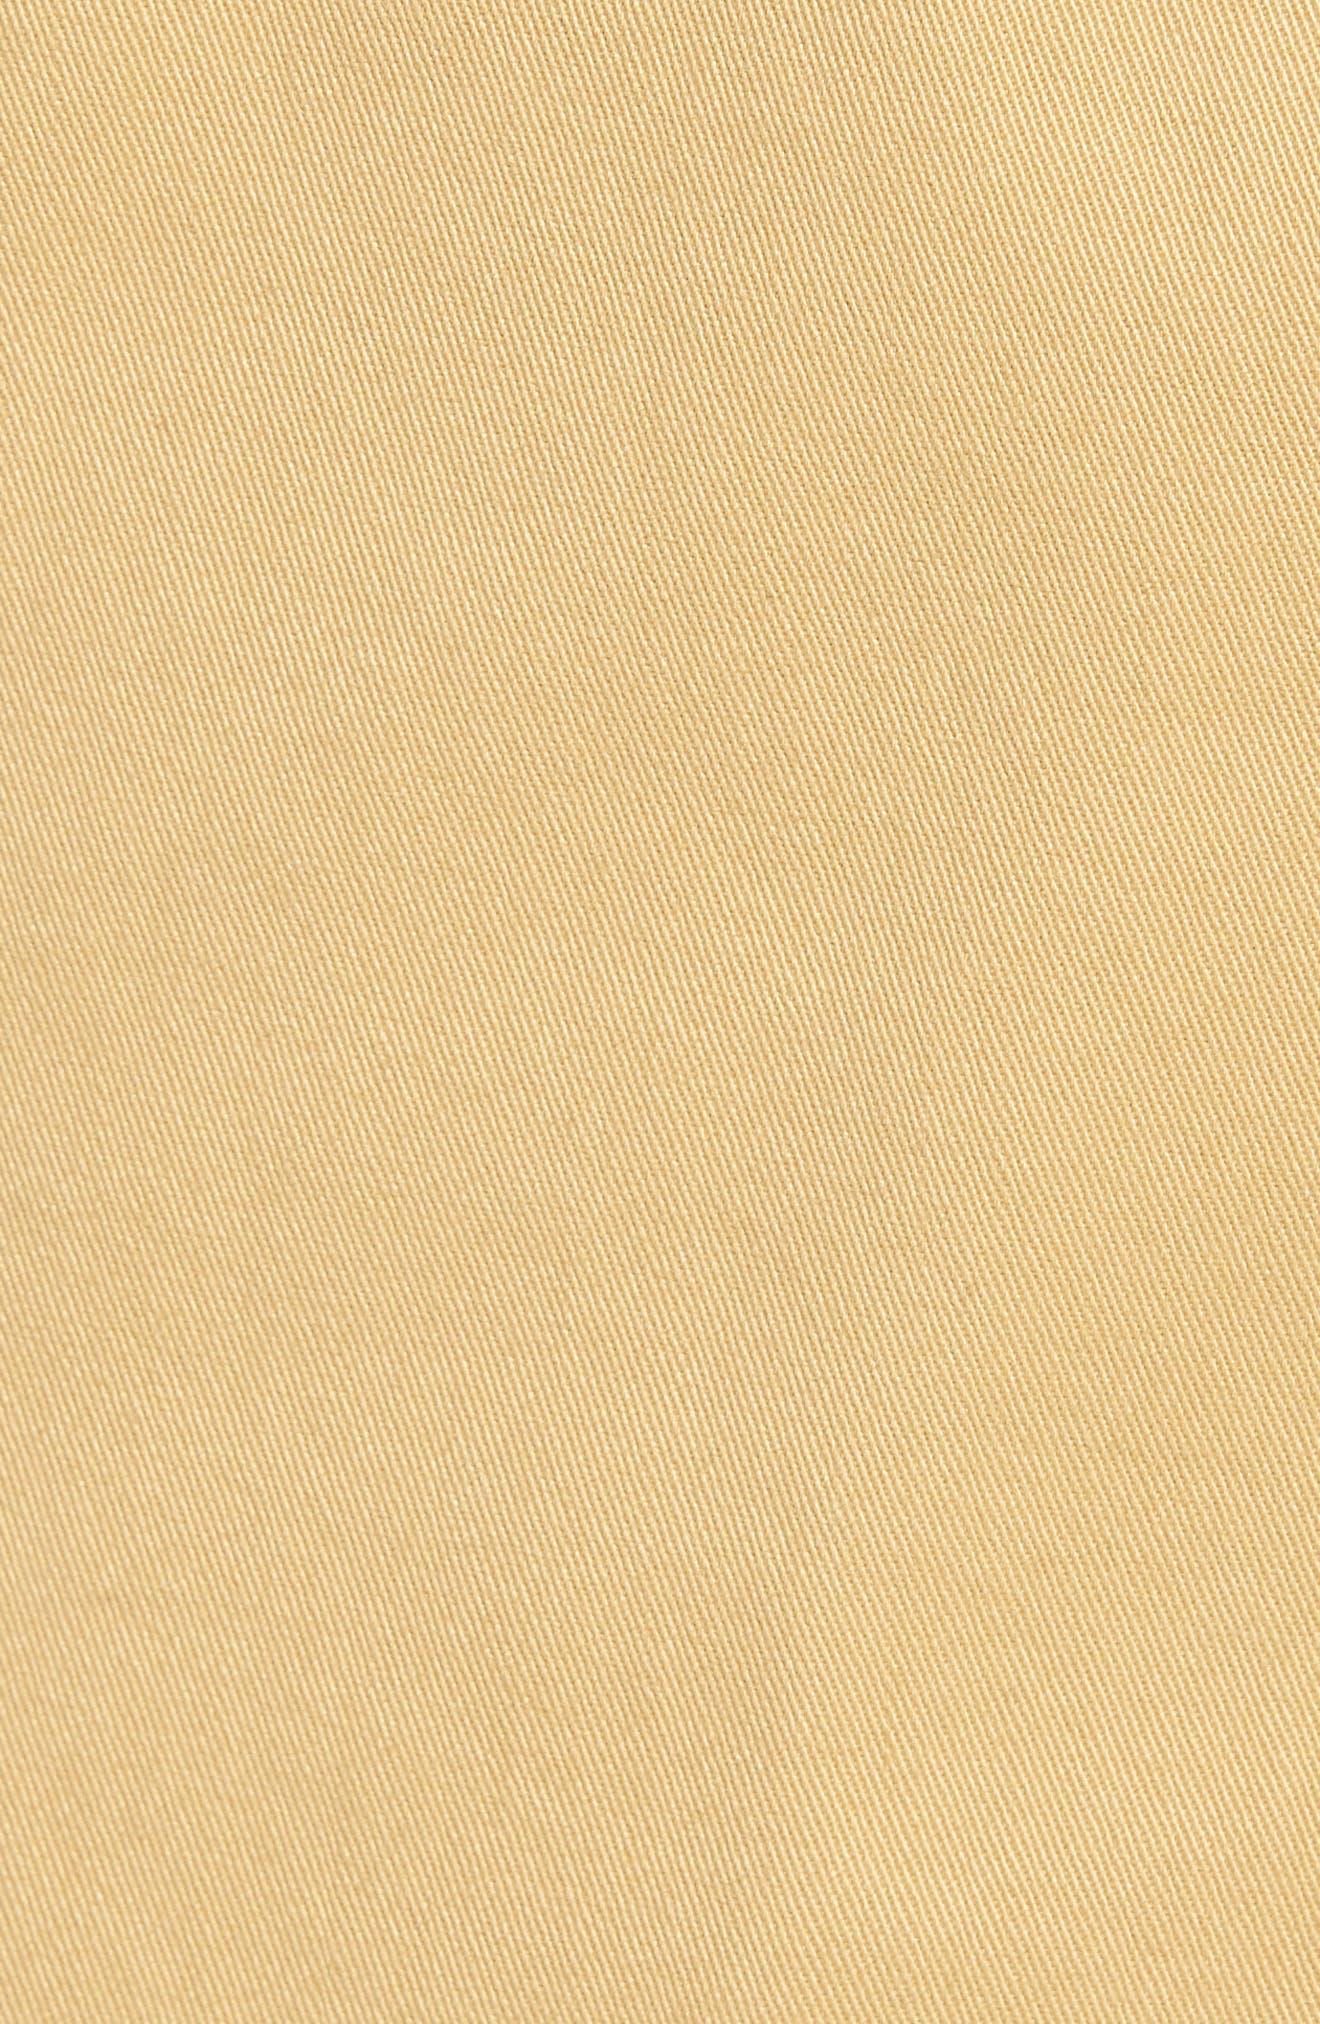 Ballard Slim Fit Shorts,                             Alternate thumbnail 5, color,                             Tan Lark